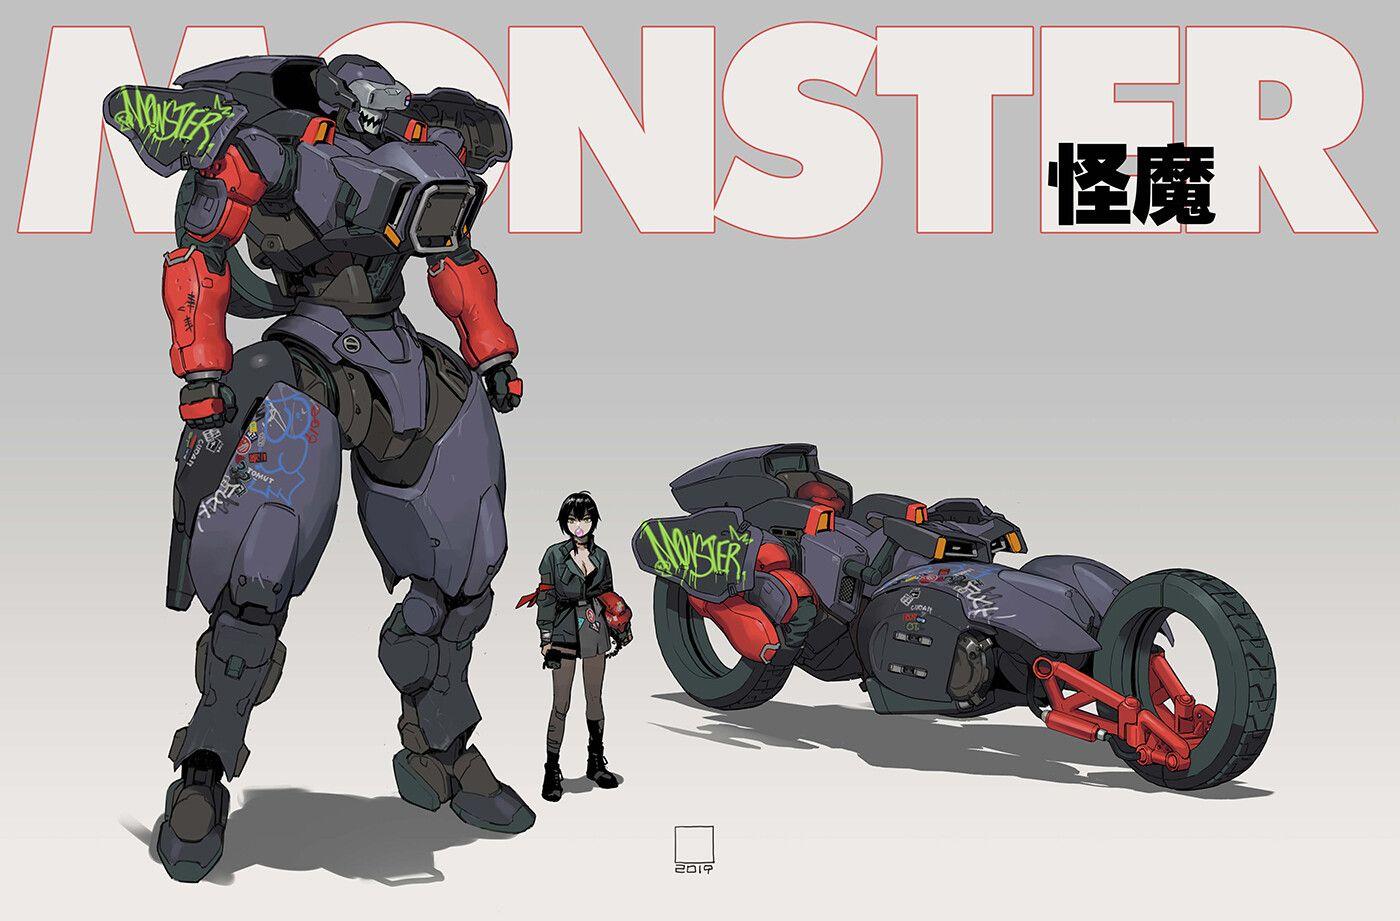 Jmes on in 2020 mecha anime robots concept mecha